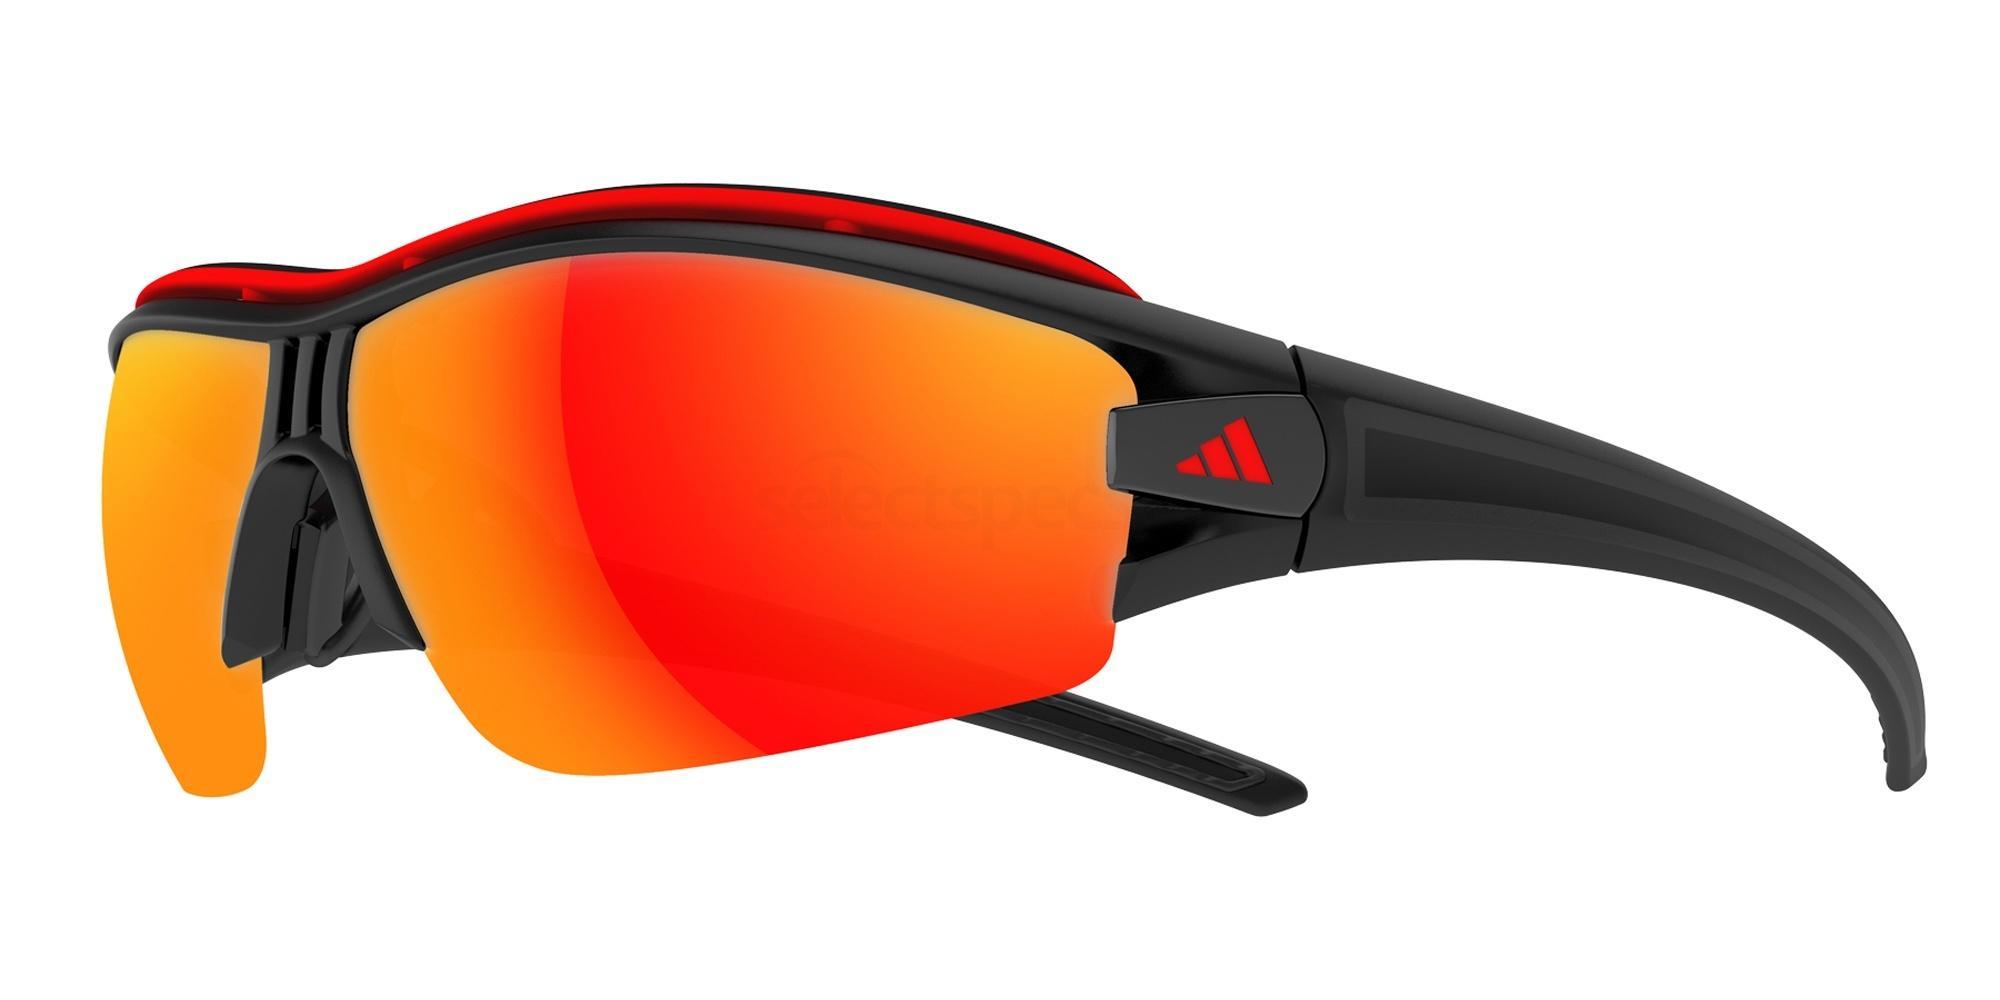 a198 00 6088 a198 Evil Eye Halfrim Pro S Sunglasses, Adidas